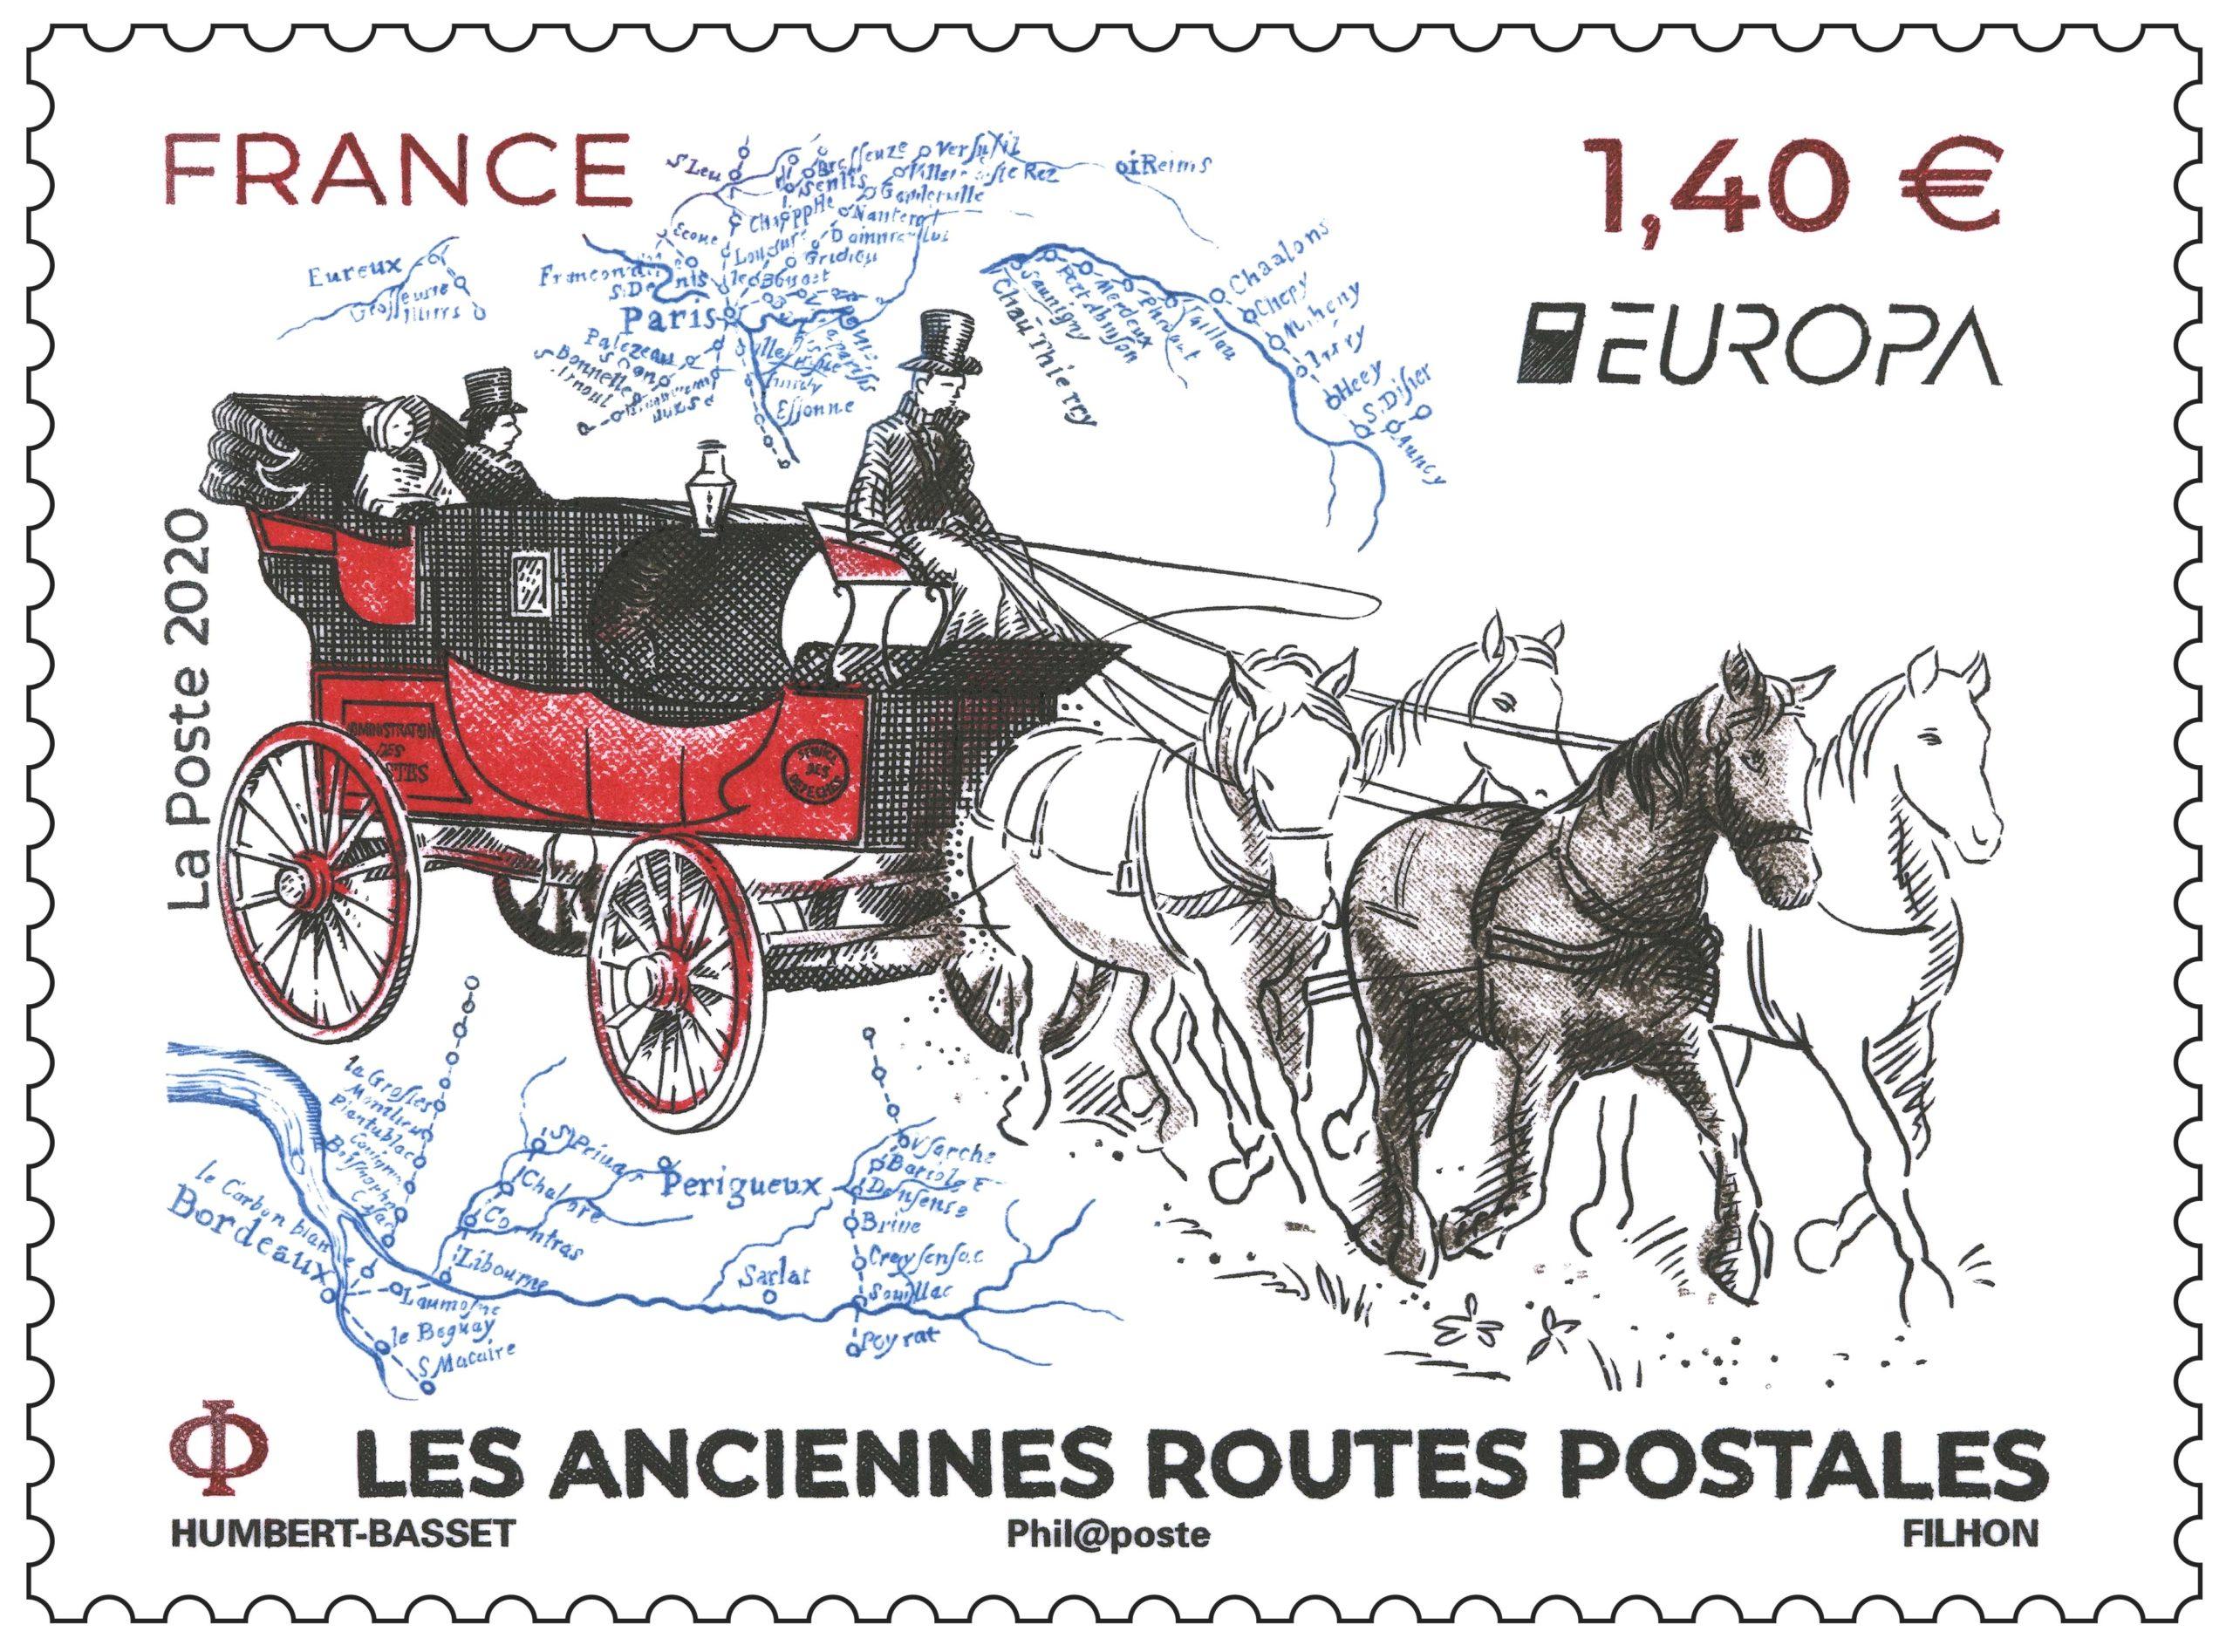 Les anciennes routes postales - Europa